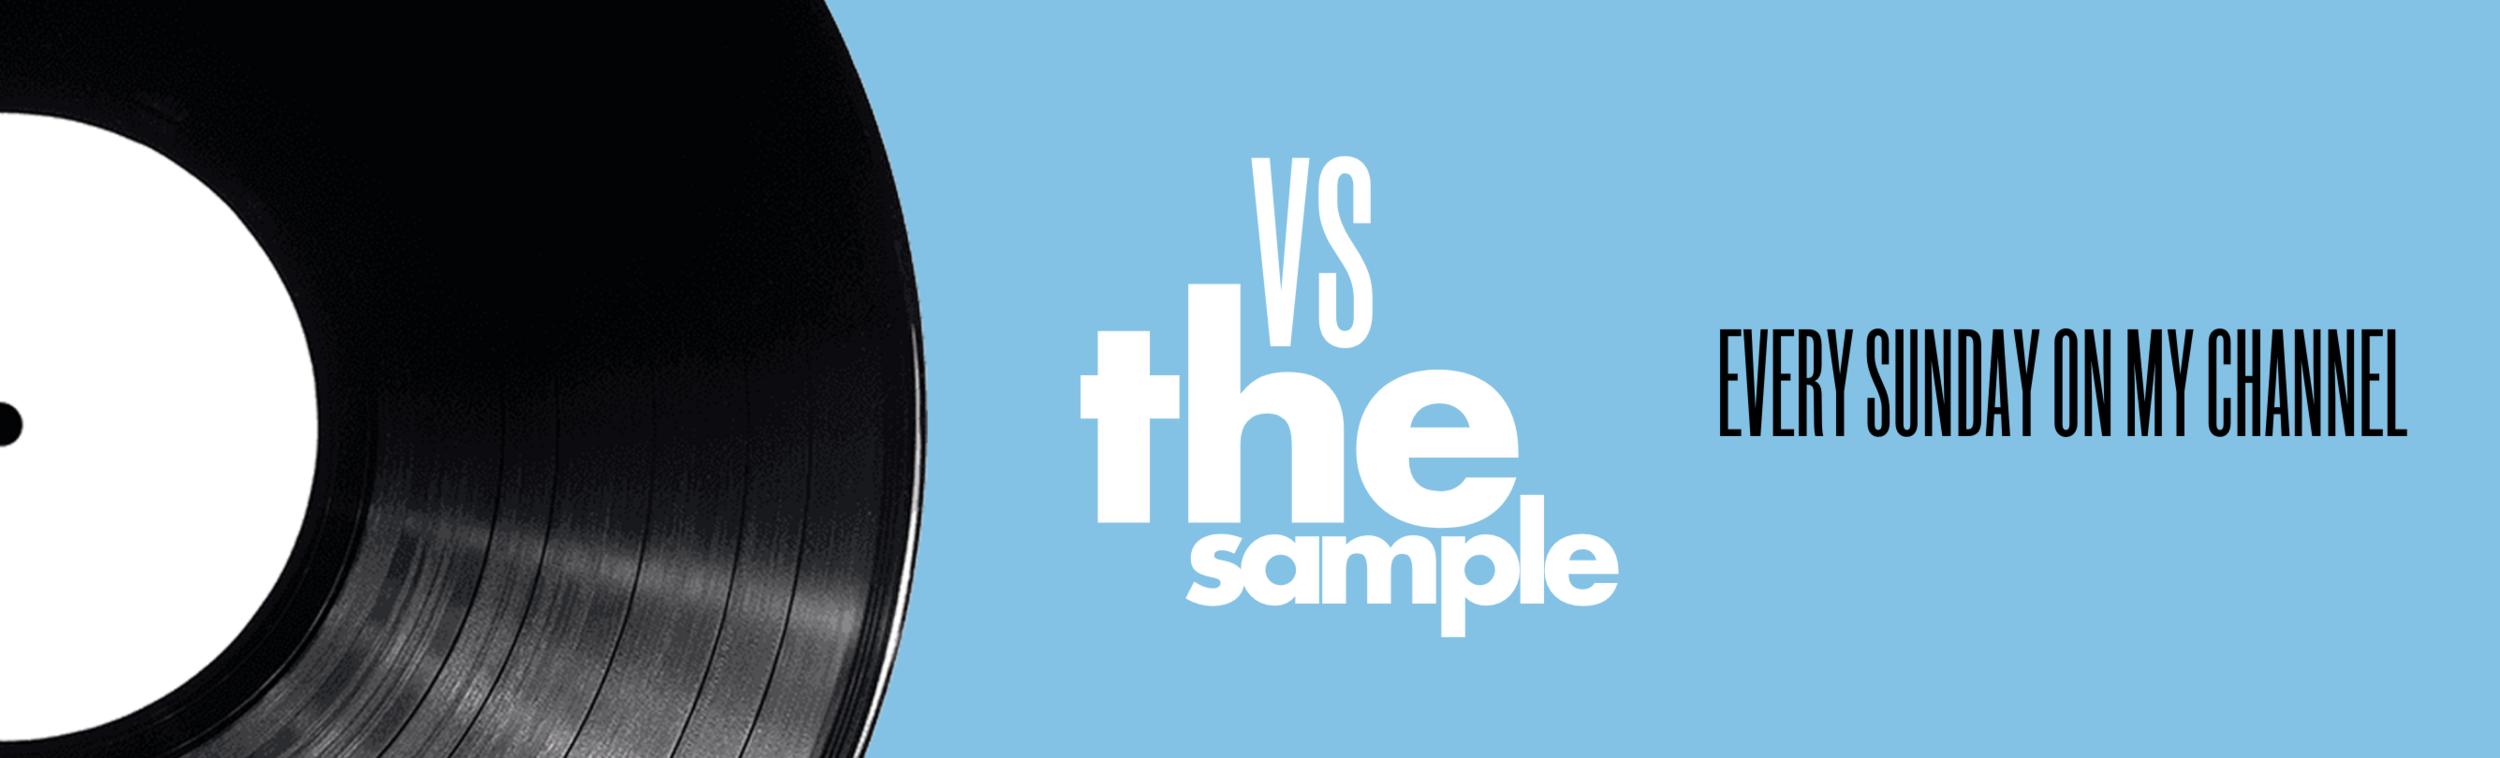 VS THE SAMPLE HEADER IMAGE - VRYWVY.png